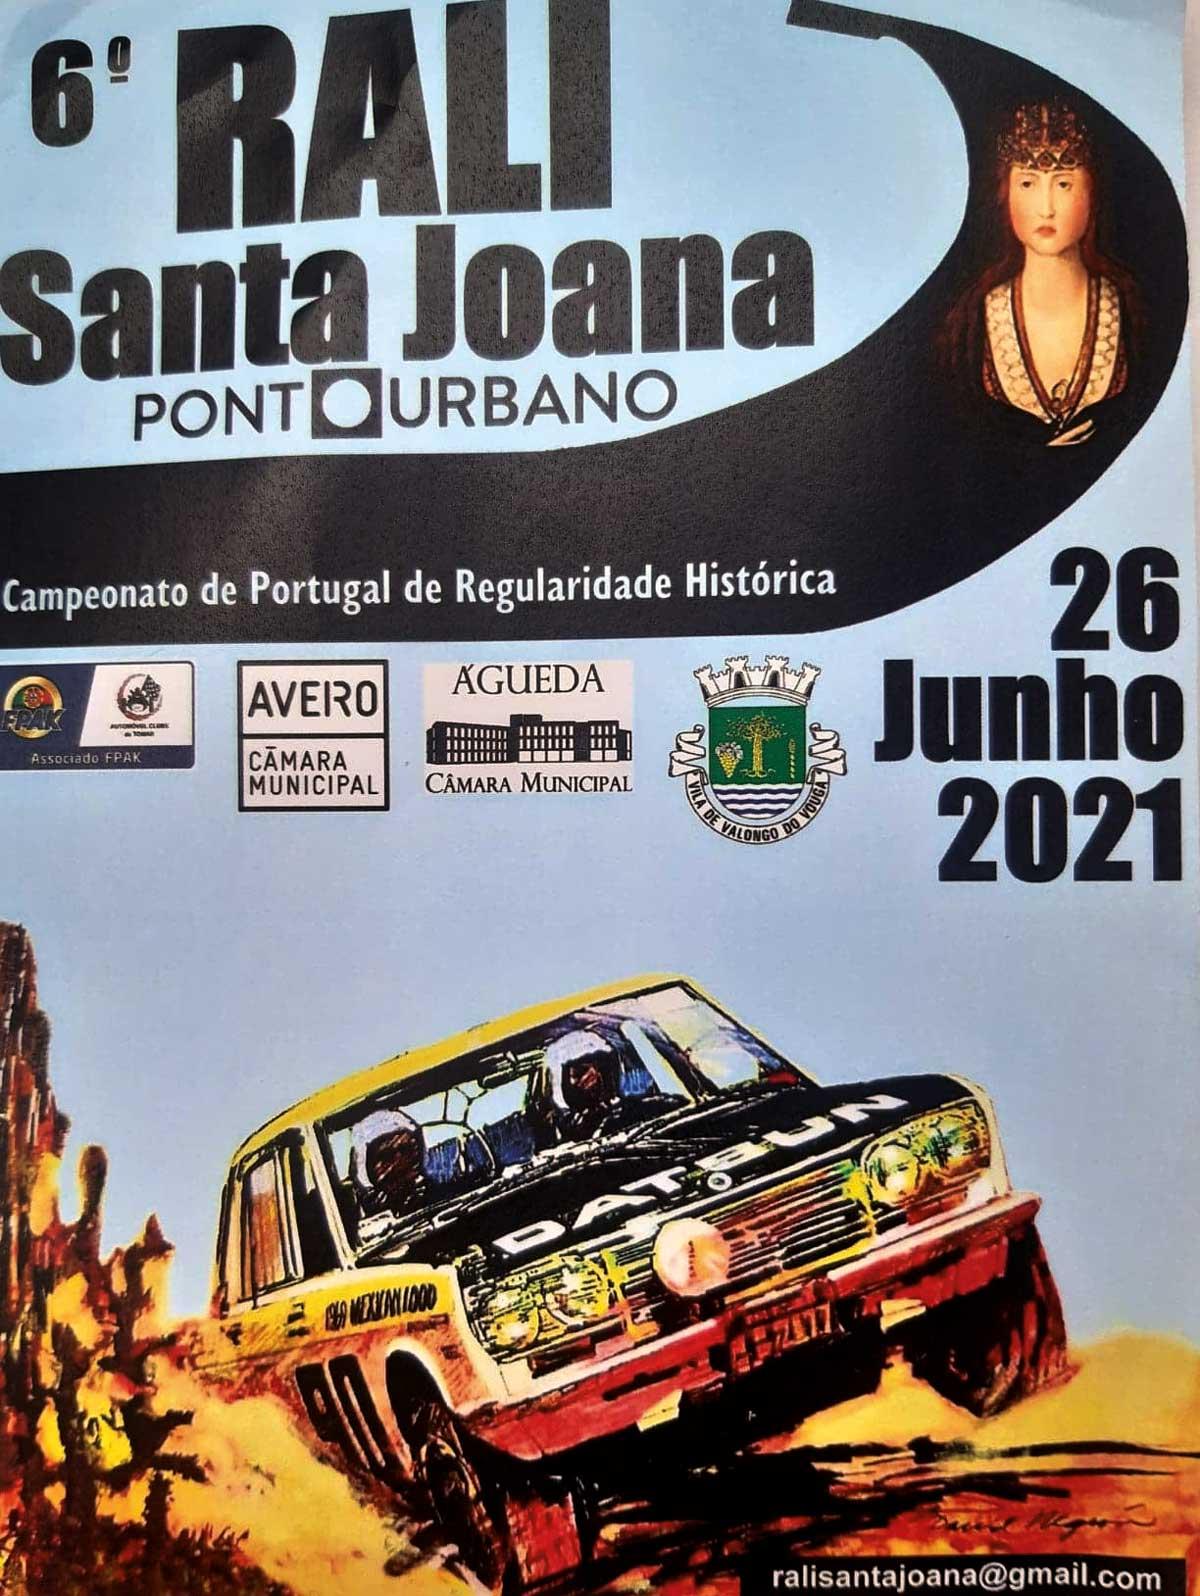 Rali Santa Joana vai para a estrada este mês